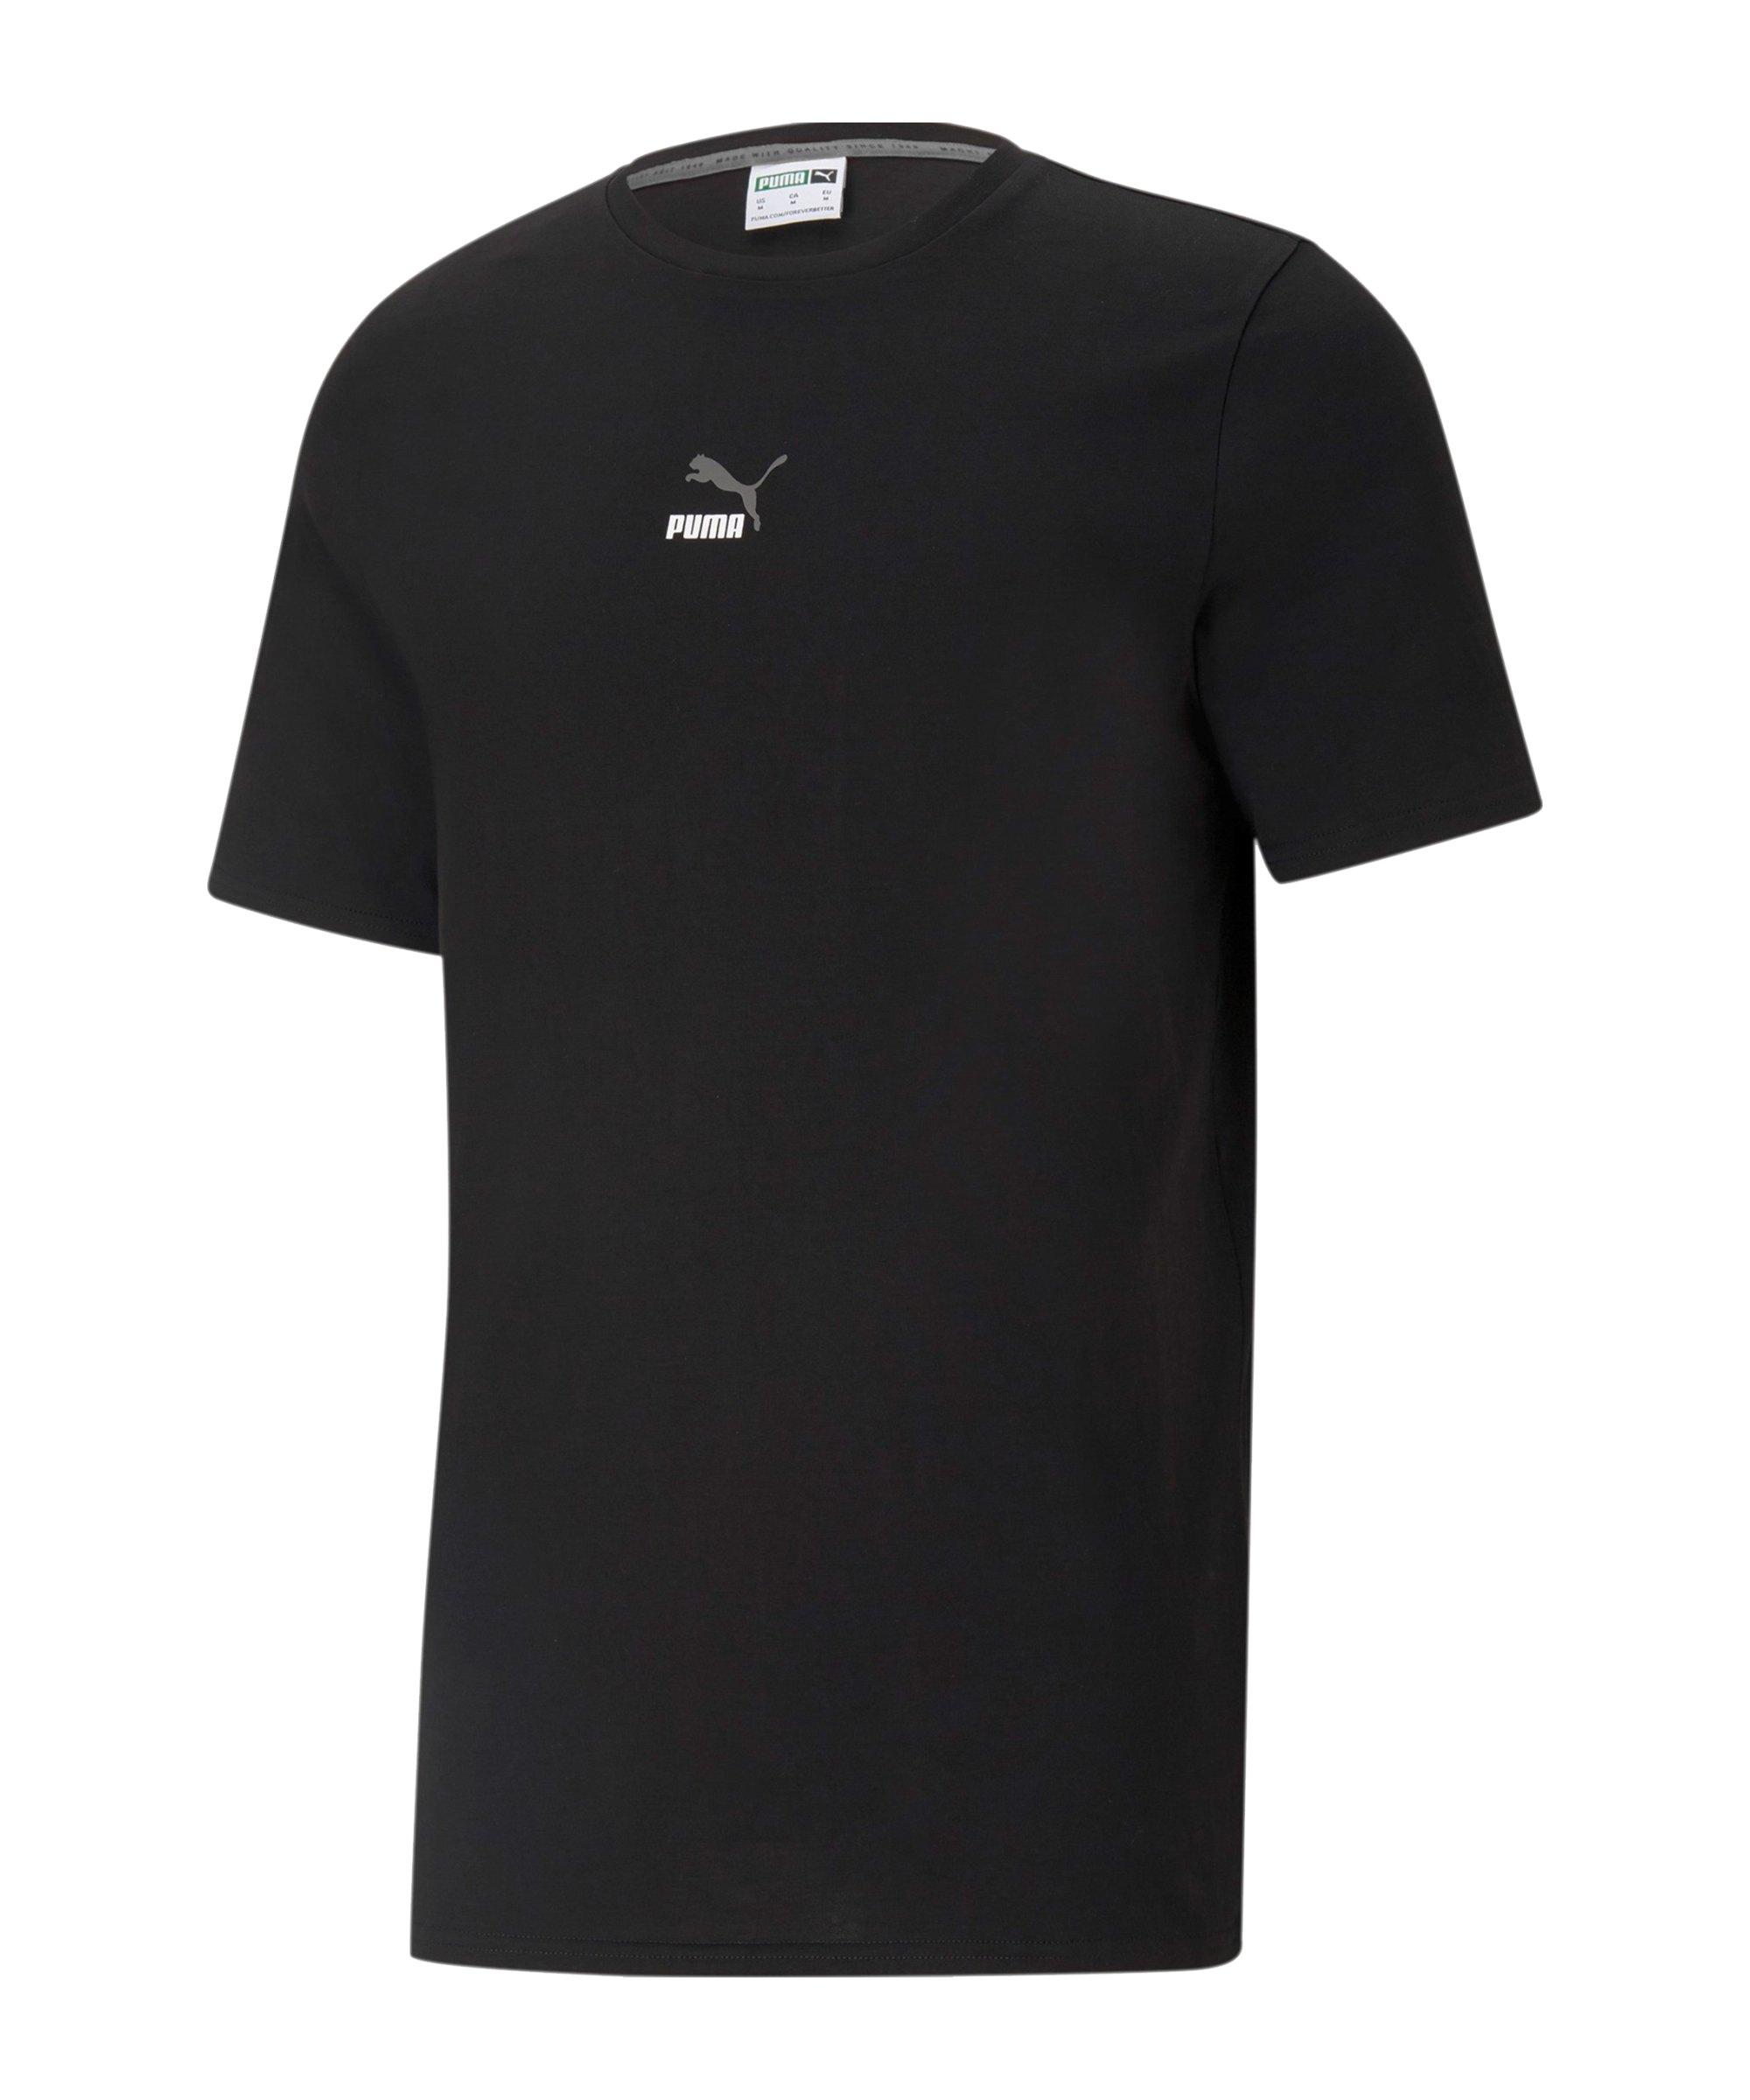 PUMA ELEVATE Tape T-Shirt Schwarz F01 - schwarz